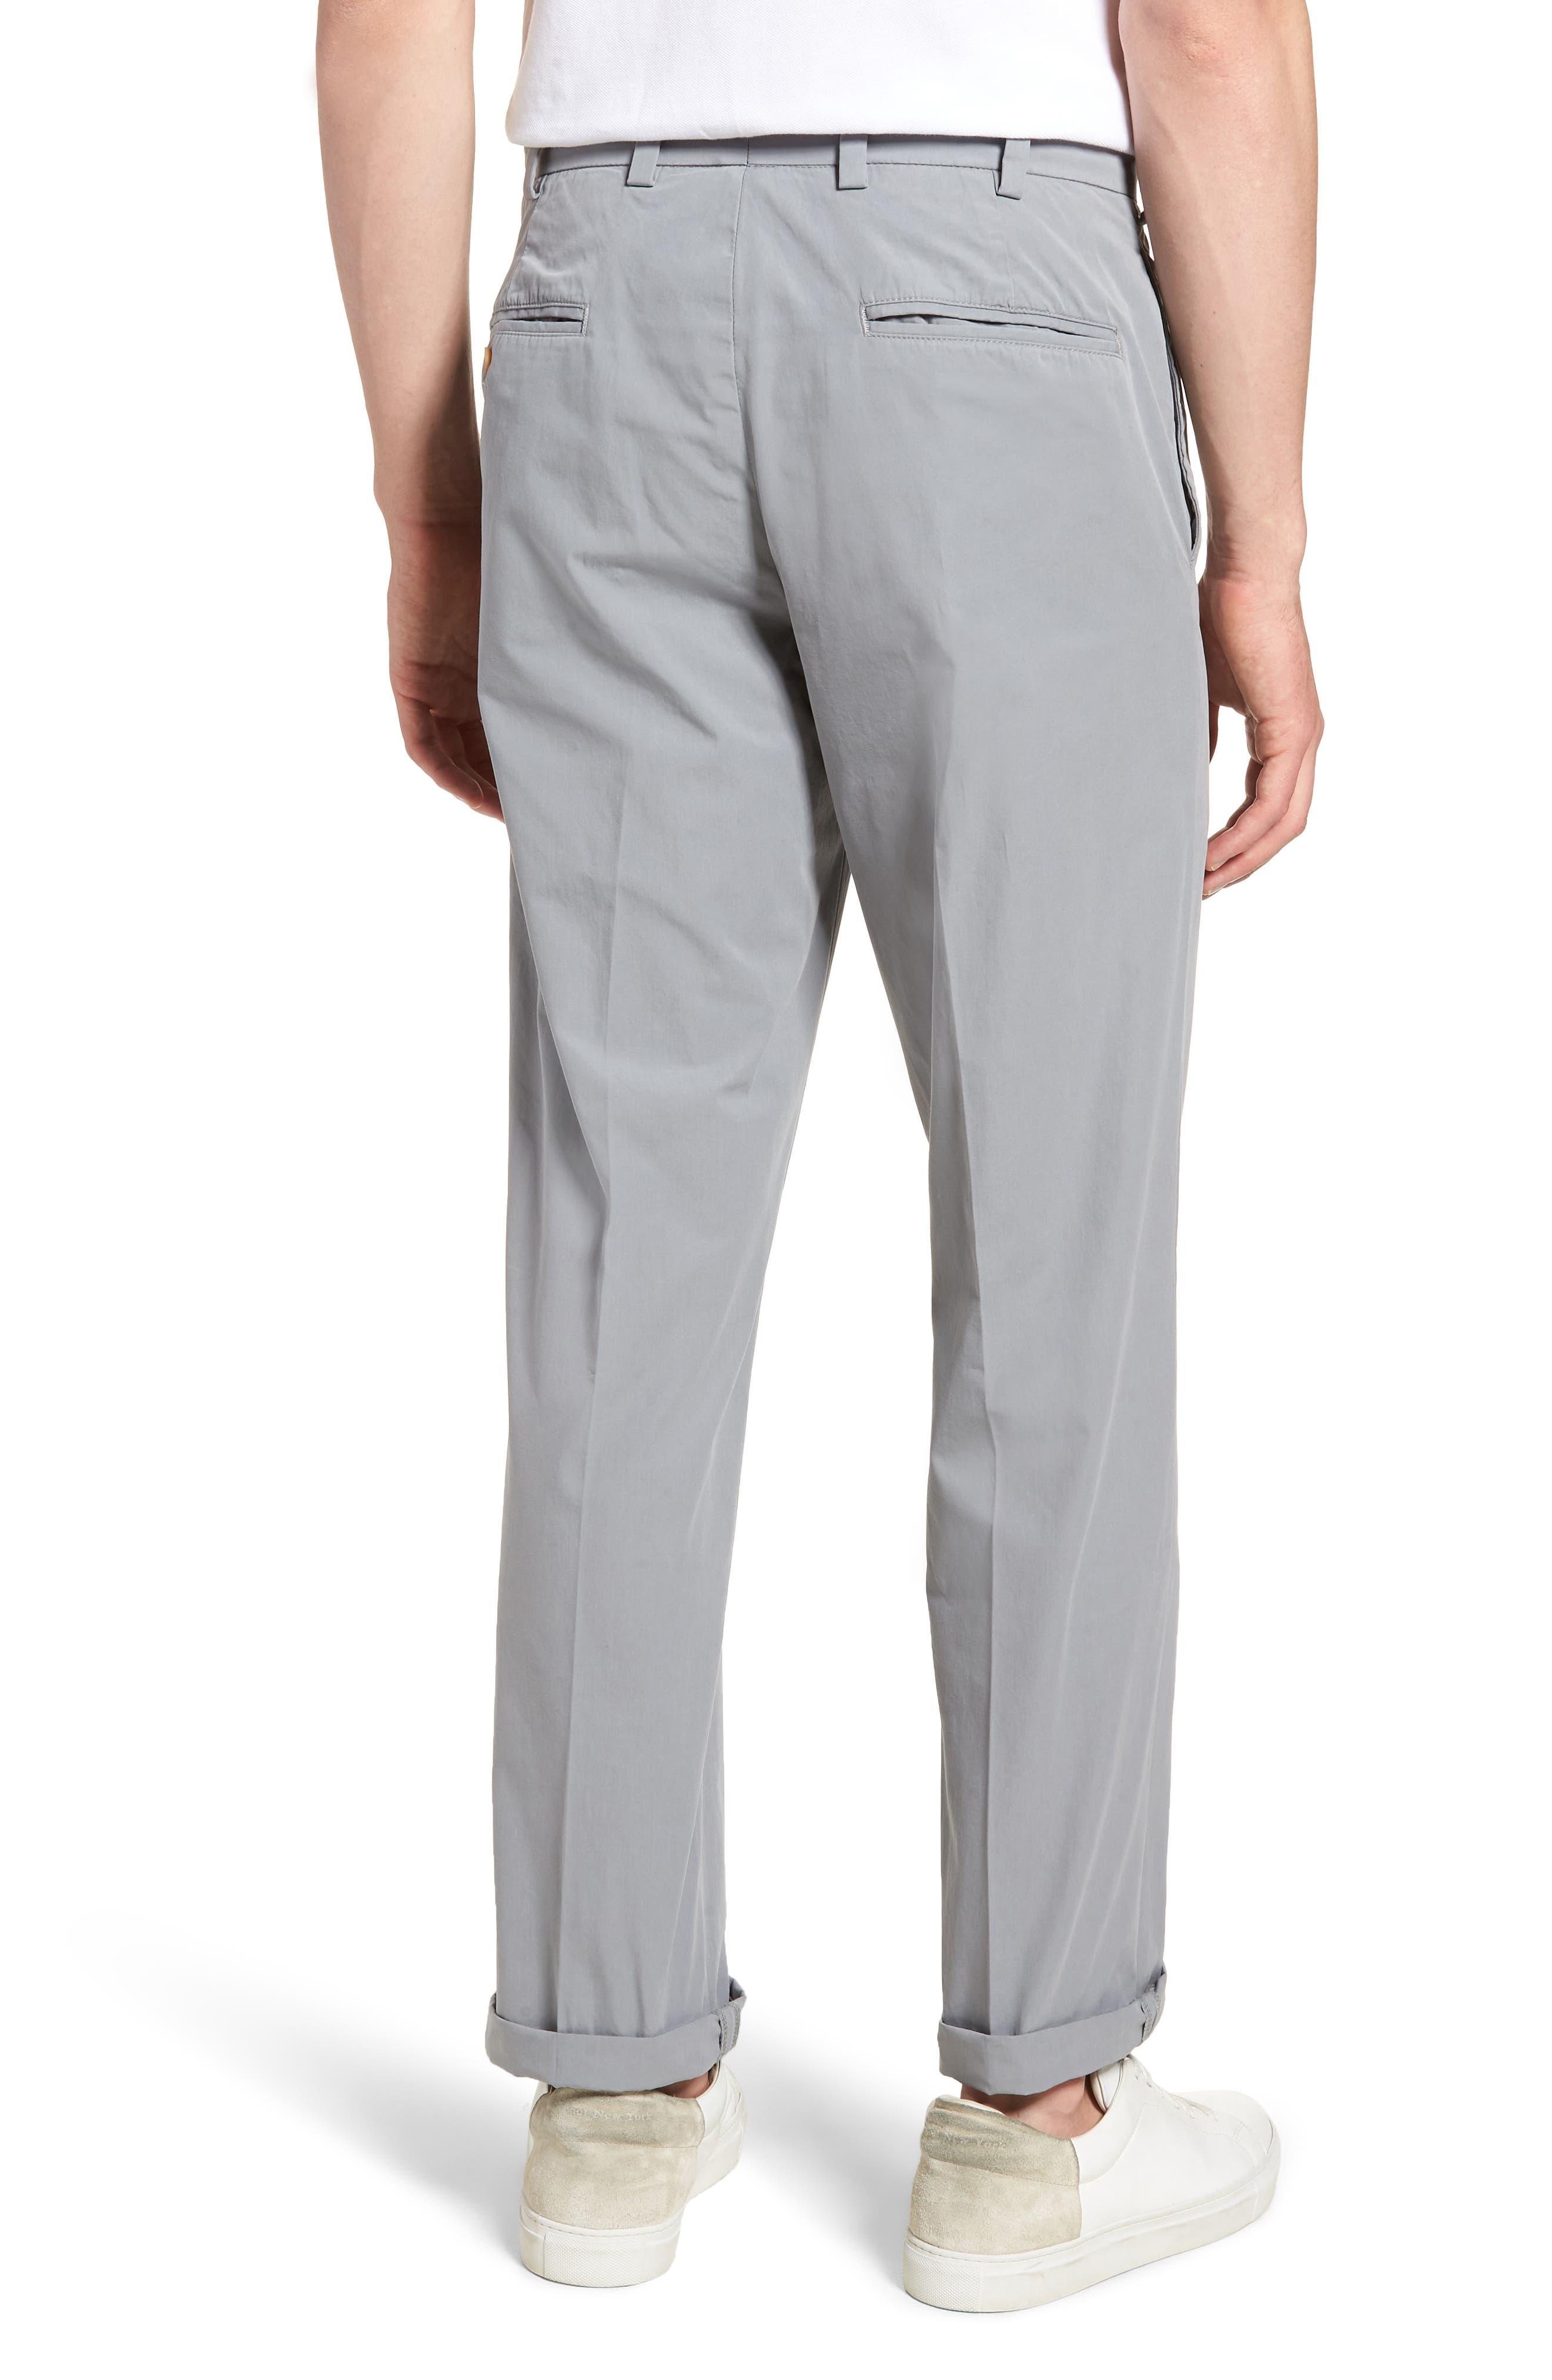 M2 Classic Fit Flat Front Tropical Cotton Poplin Pants,                             Alternate thumbnail 2, color,                             Nickel